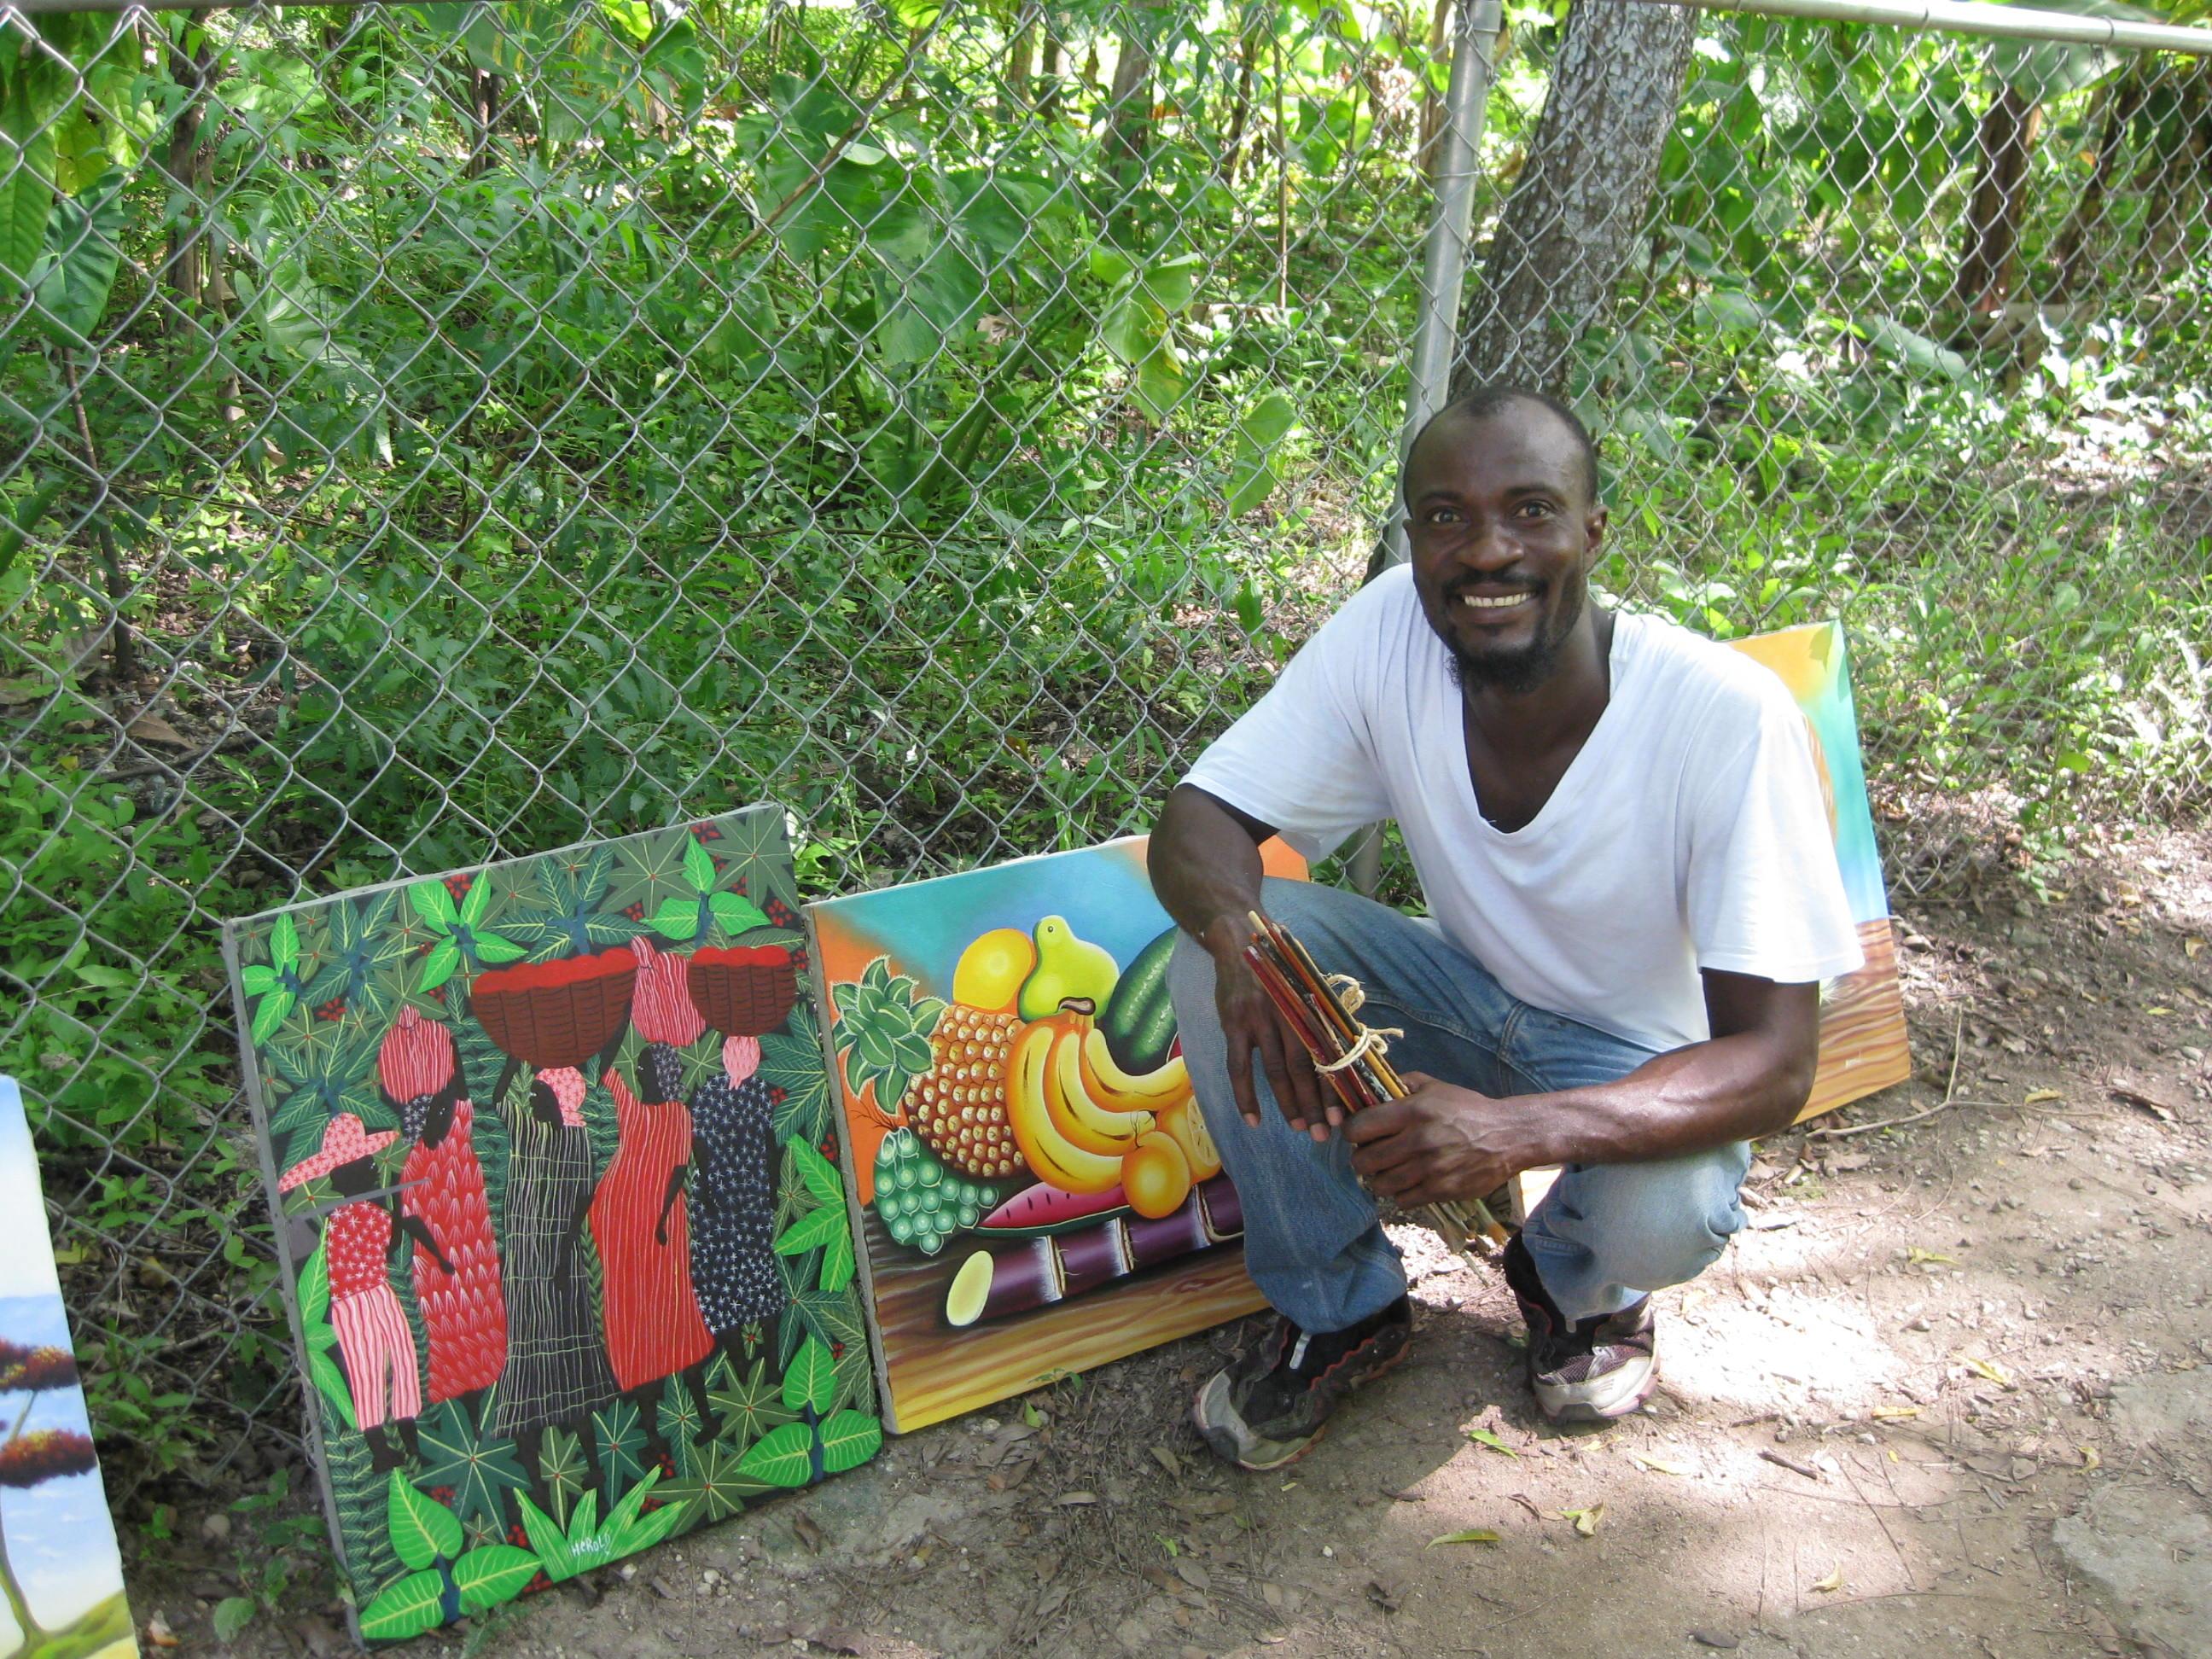 artist Herold St. Louis